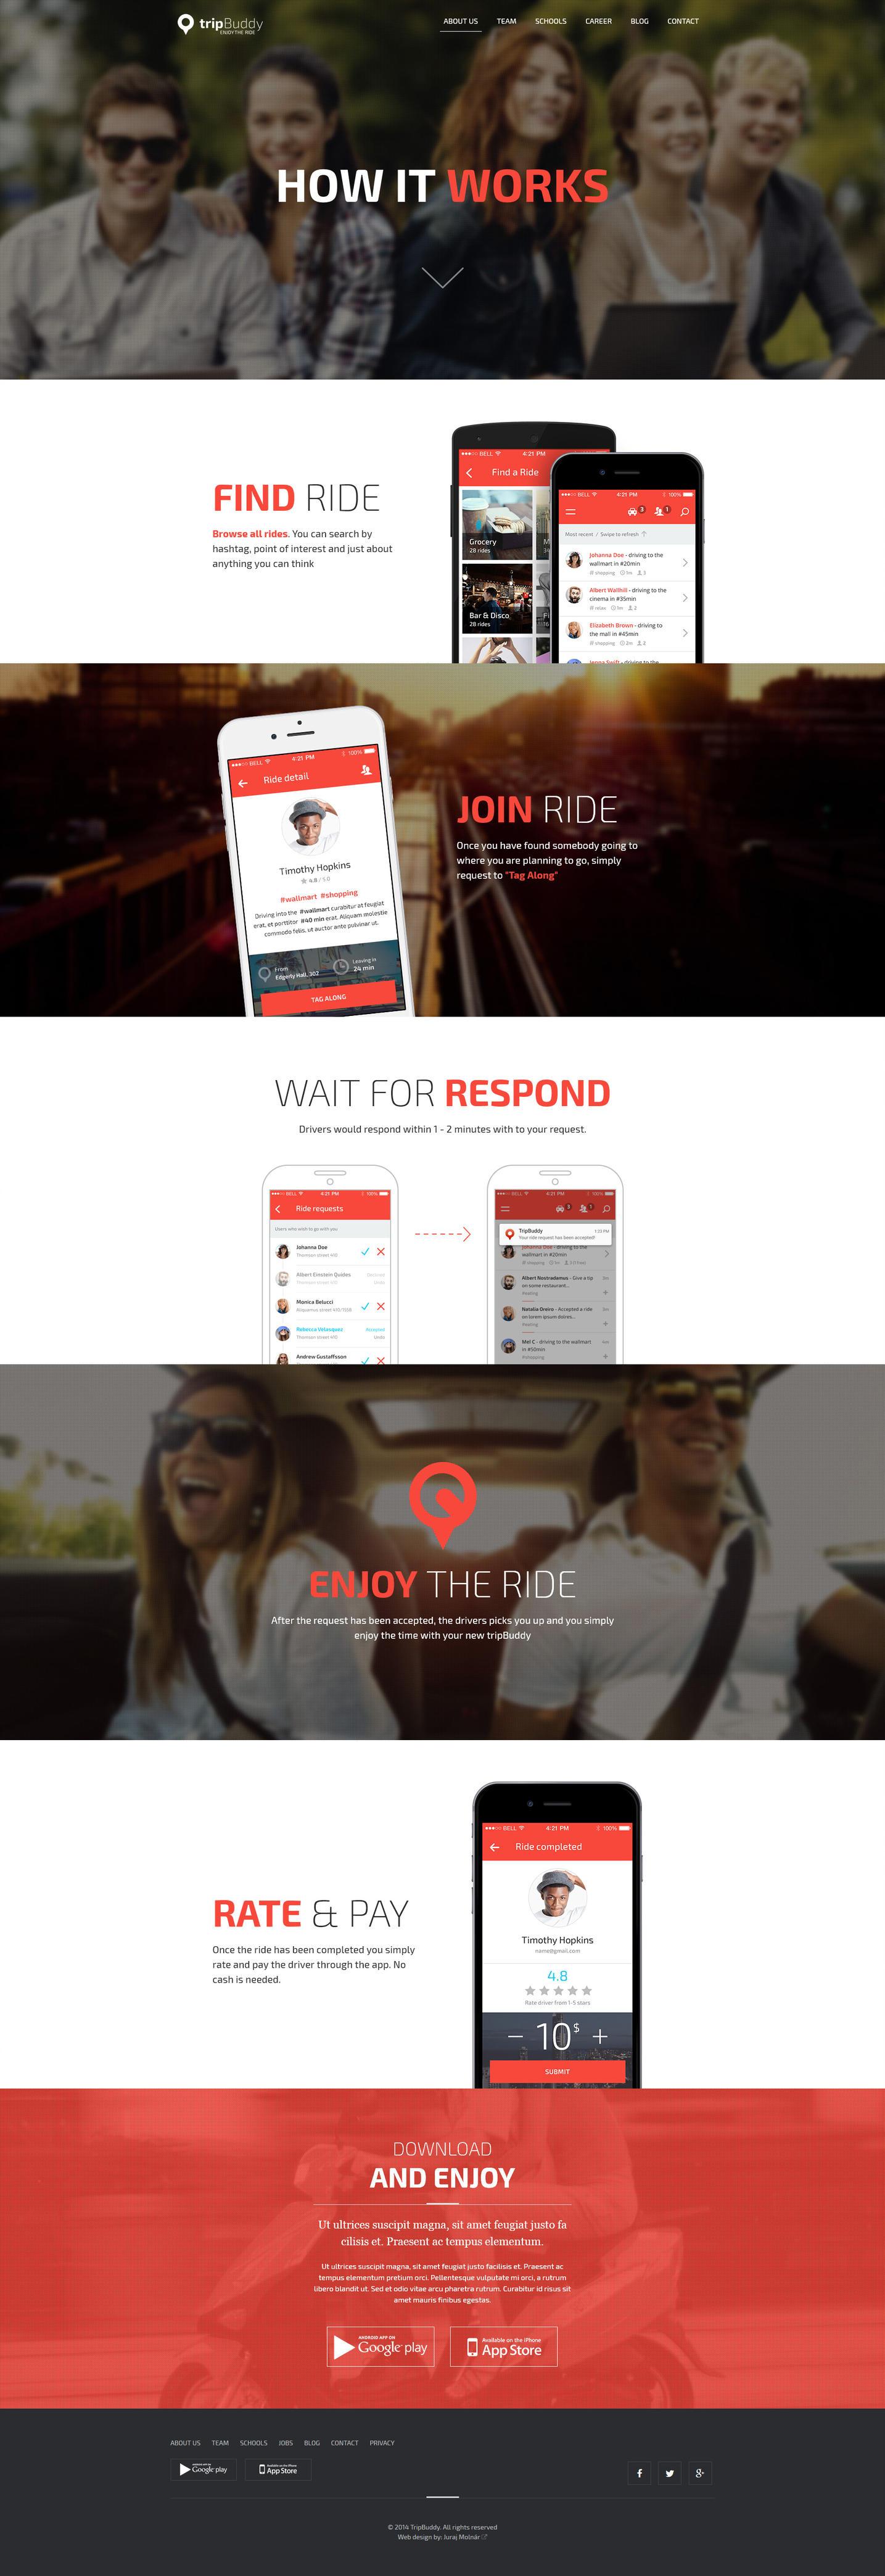 Trip buddy - landing page for web application by jurajmolnar